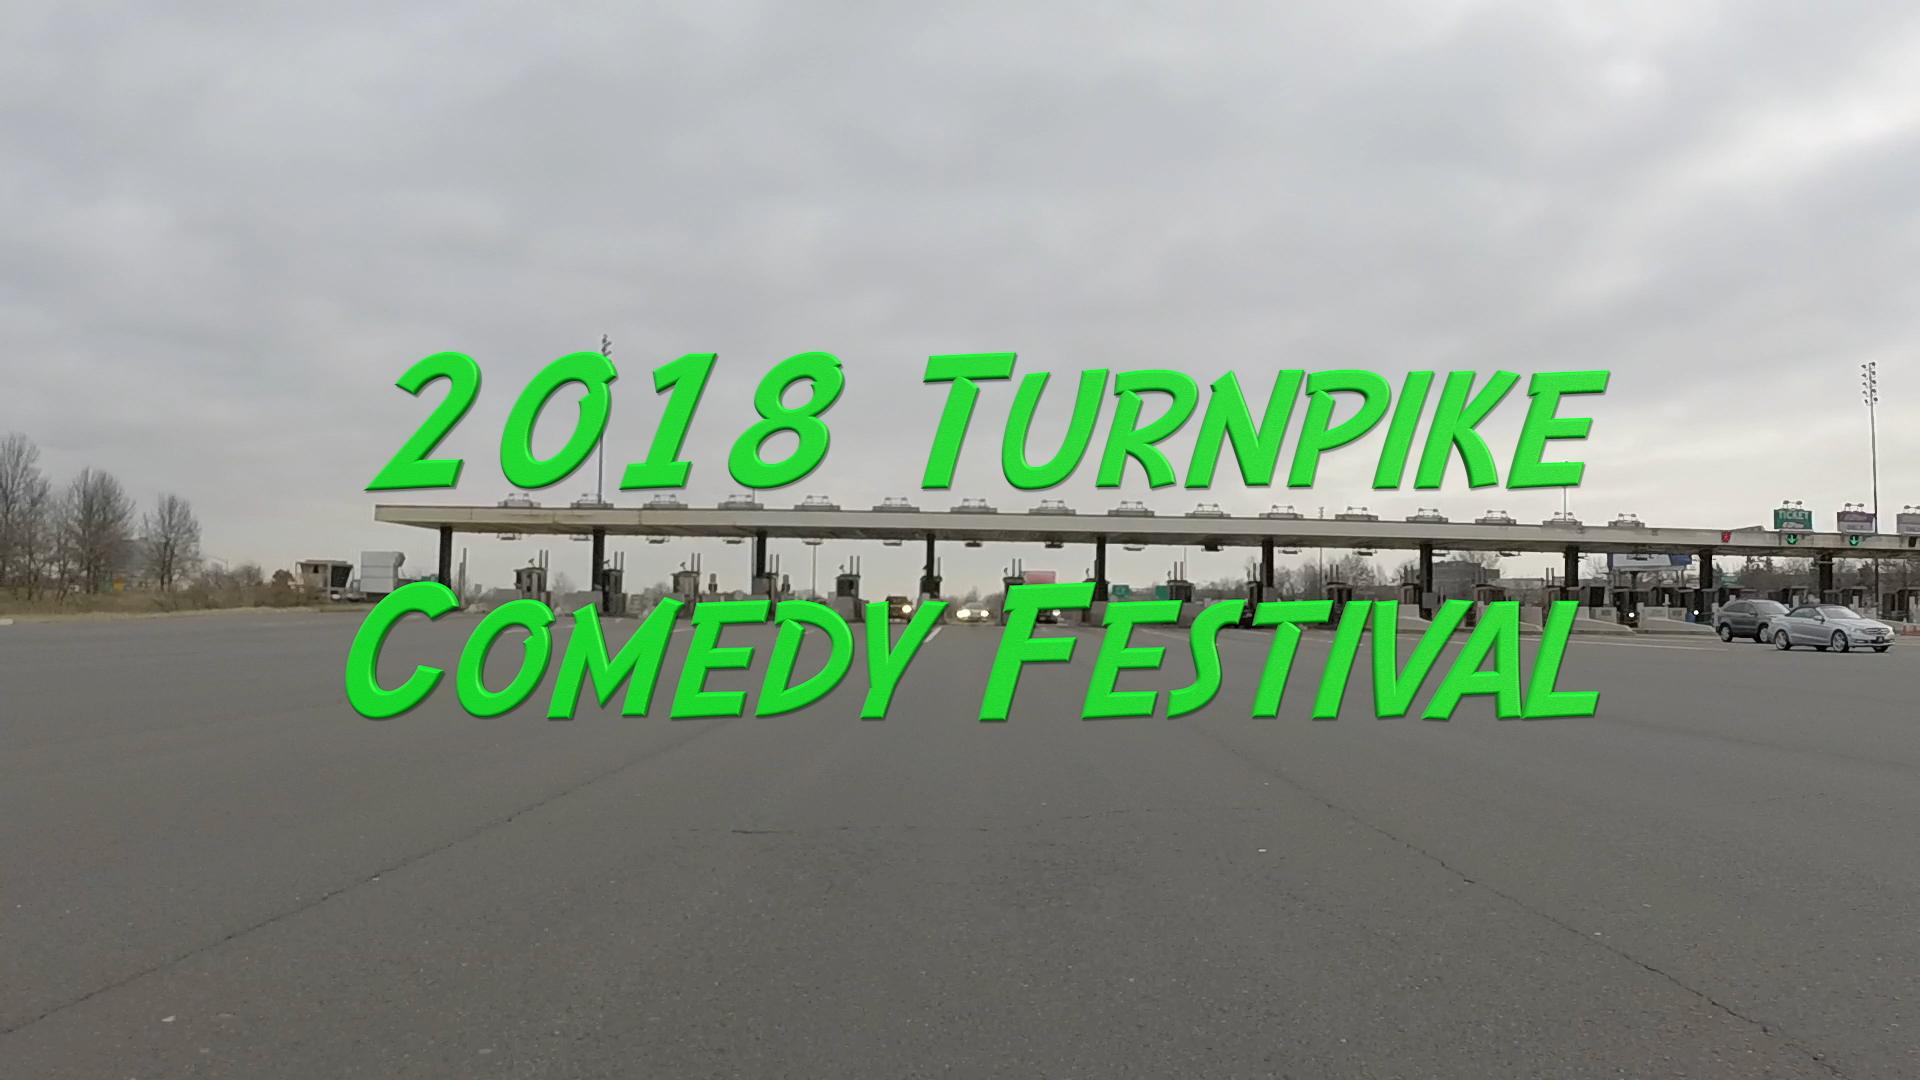 Turnpike Comedy Festival